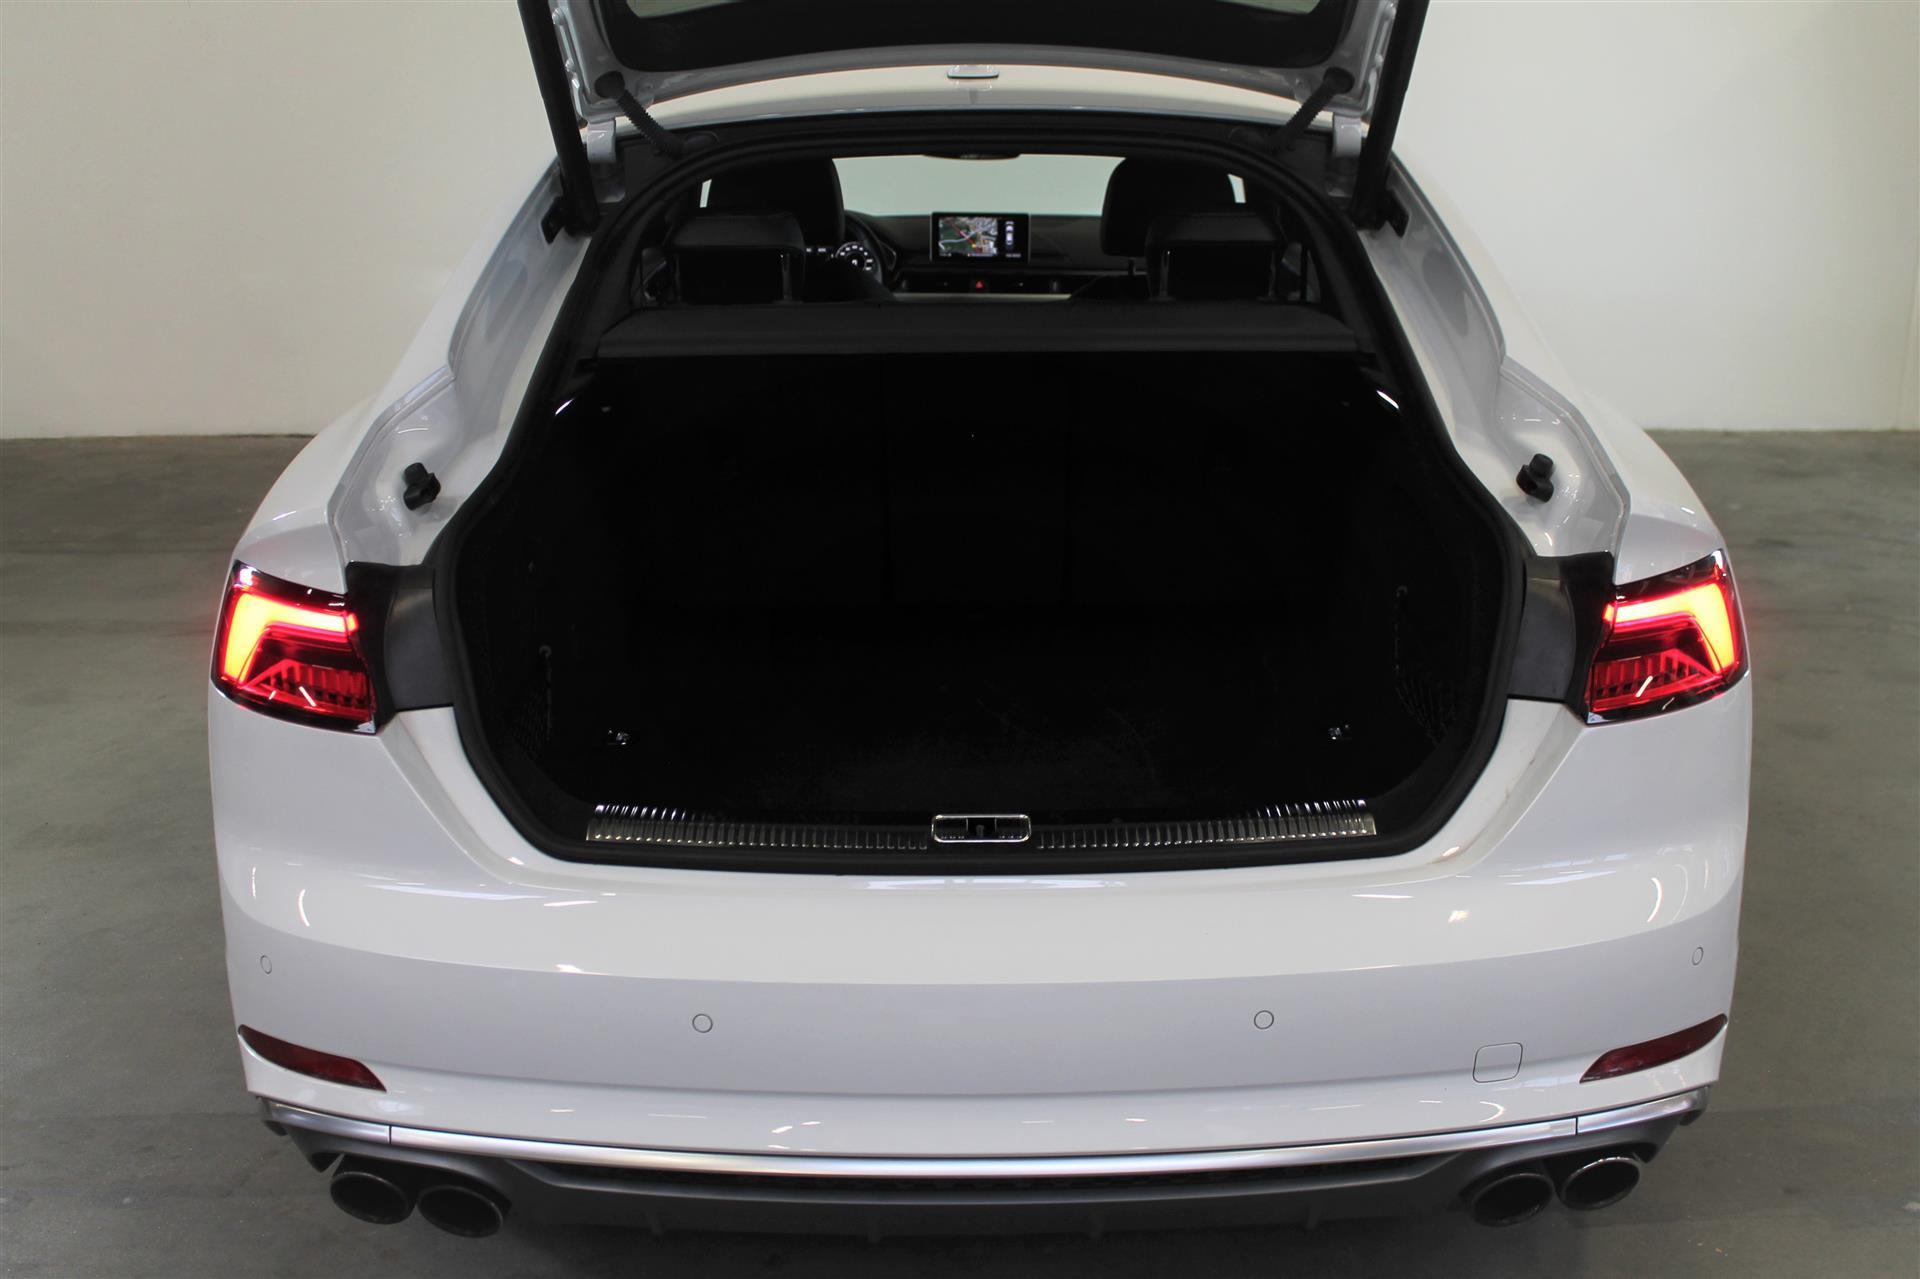 Sportback 3,0 TFSI Quattro Tiptr. 354HK 5d 8g Trinl. Gear image10